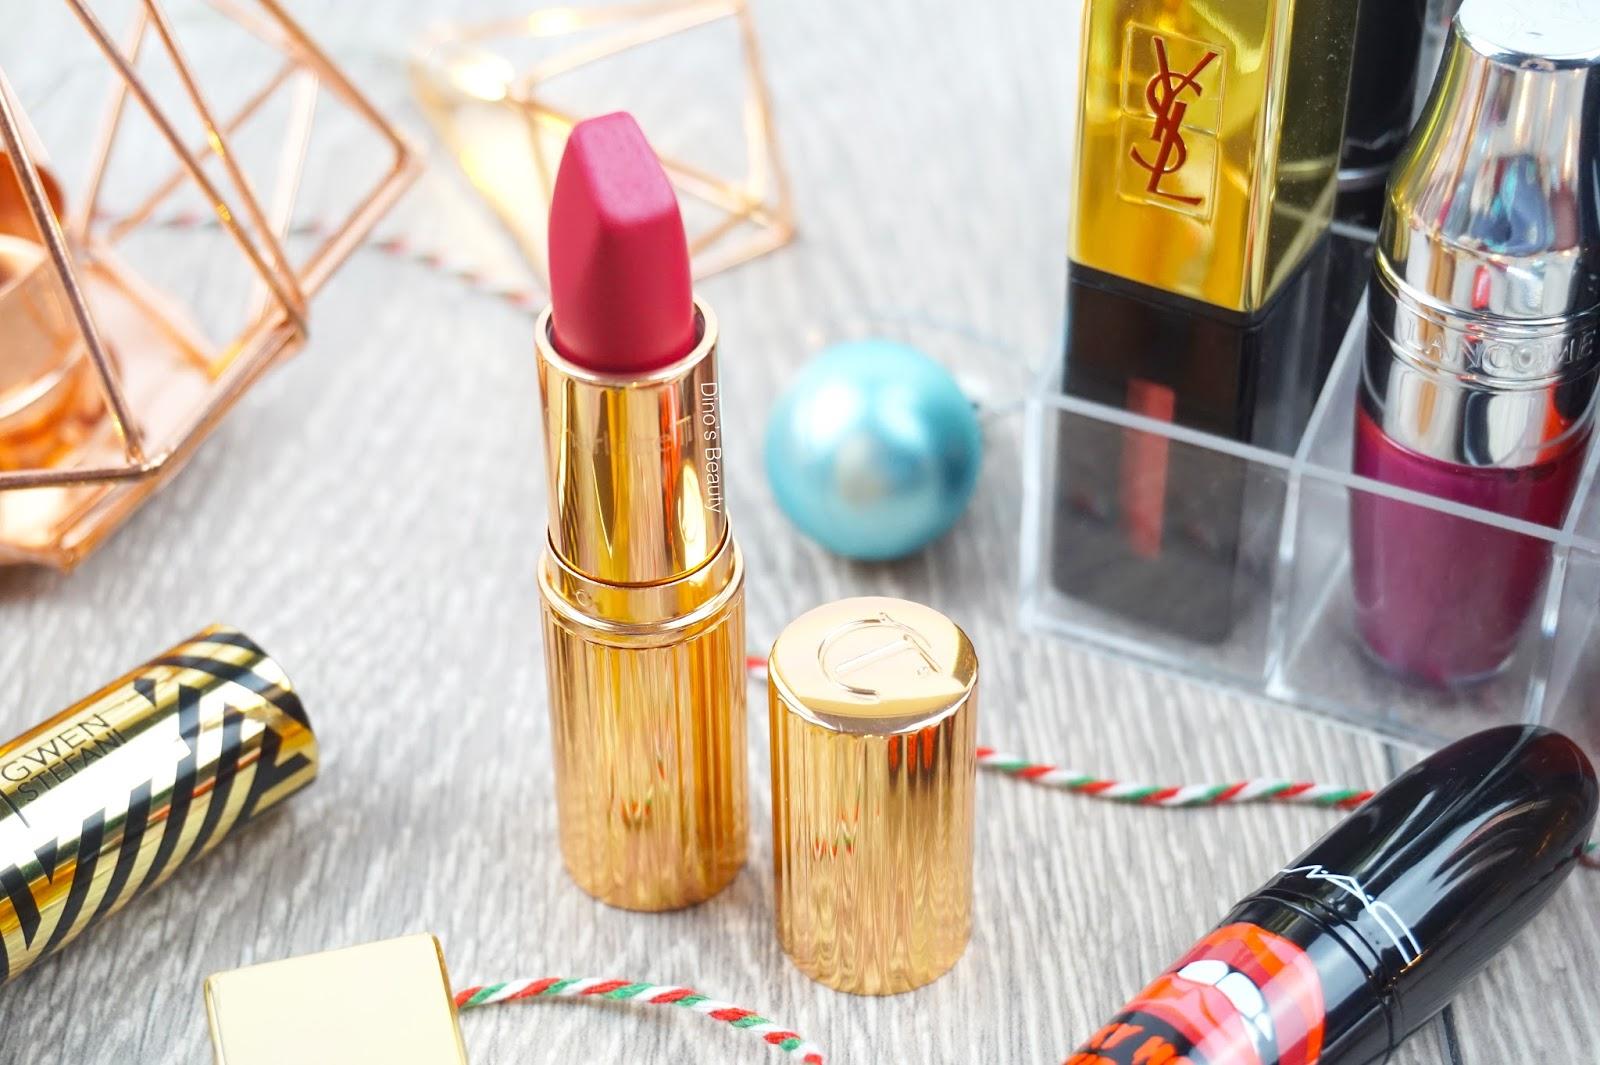 bbloggers, beauty, beauty bloggers, beauty review, Charlotte Tilbury, Matte Revolution, The Queen, Matte, pigmented, bold, red lips